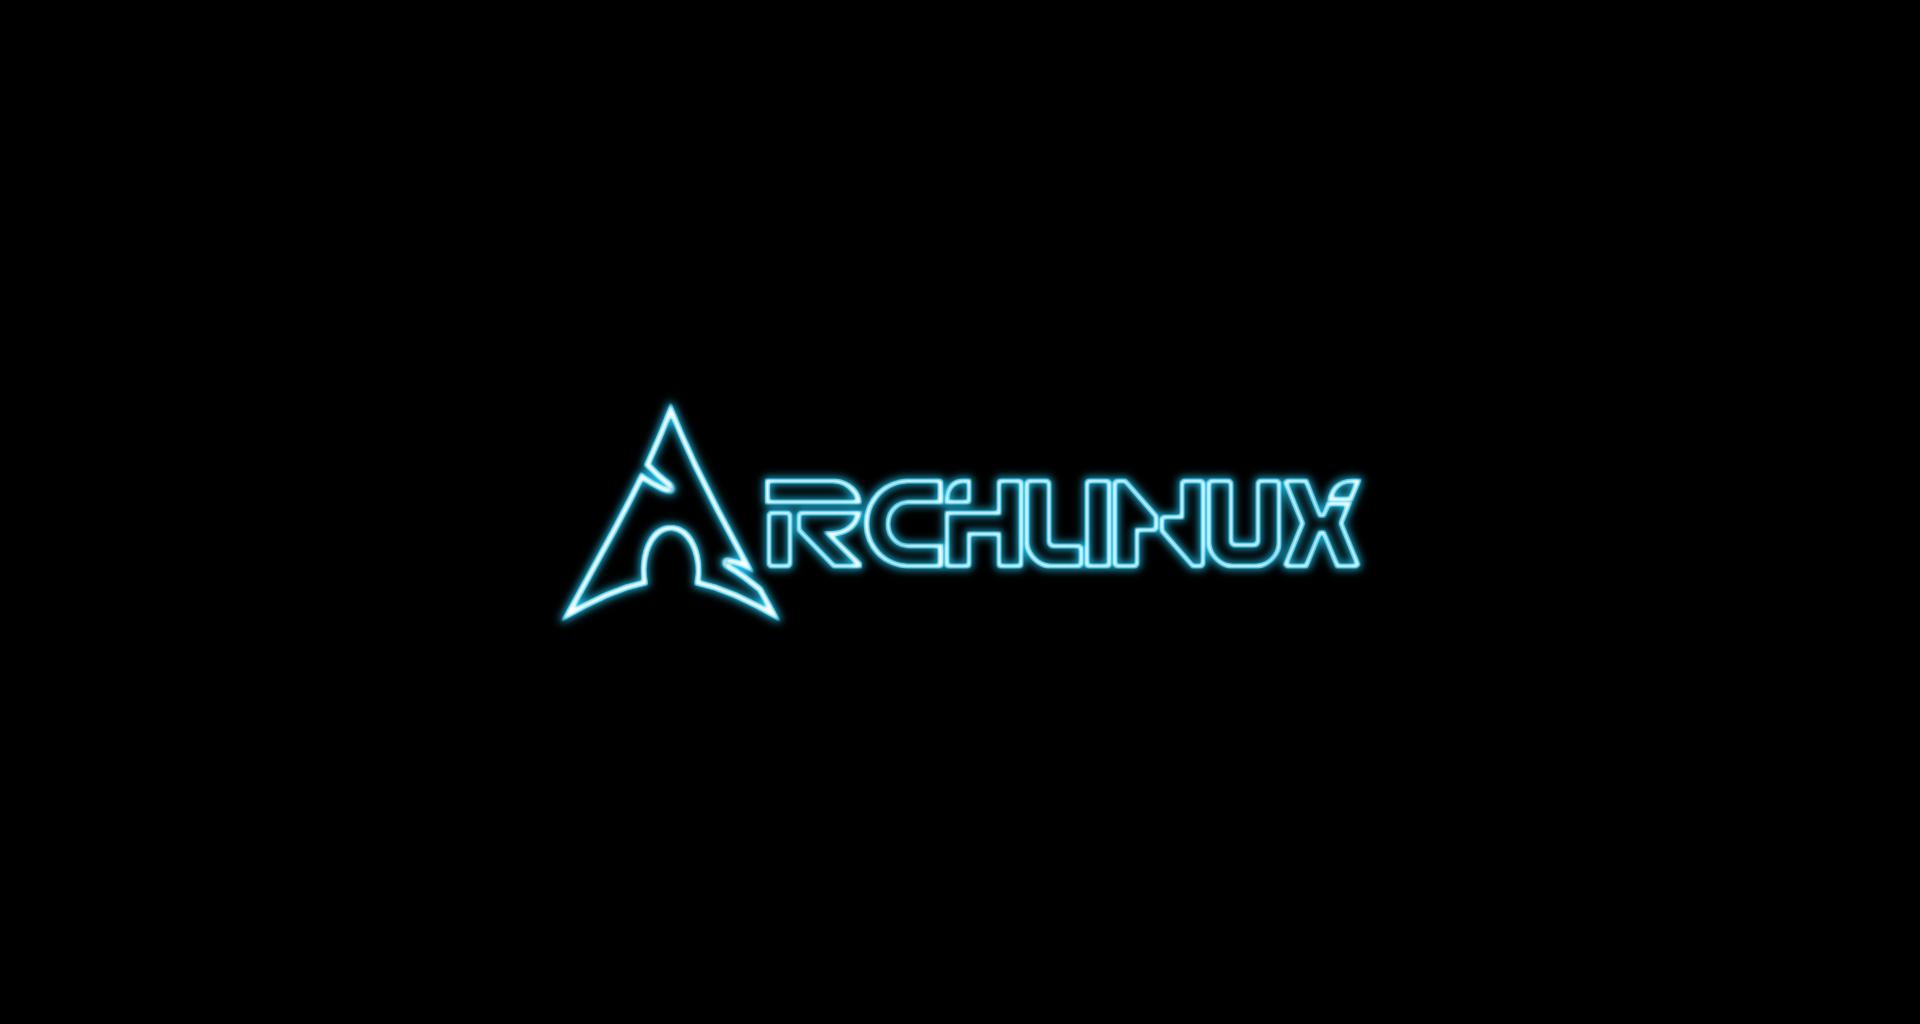 Linux Arch 19201024 Wallpaper 2170231 1920x1024